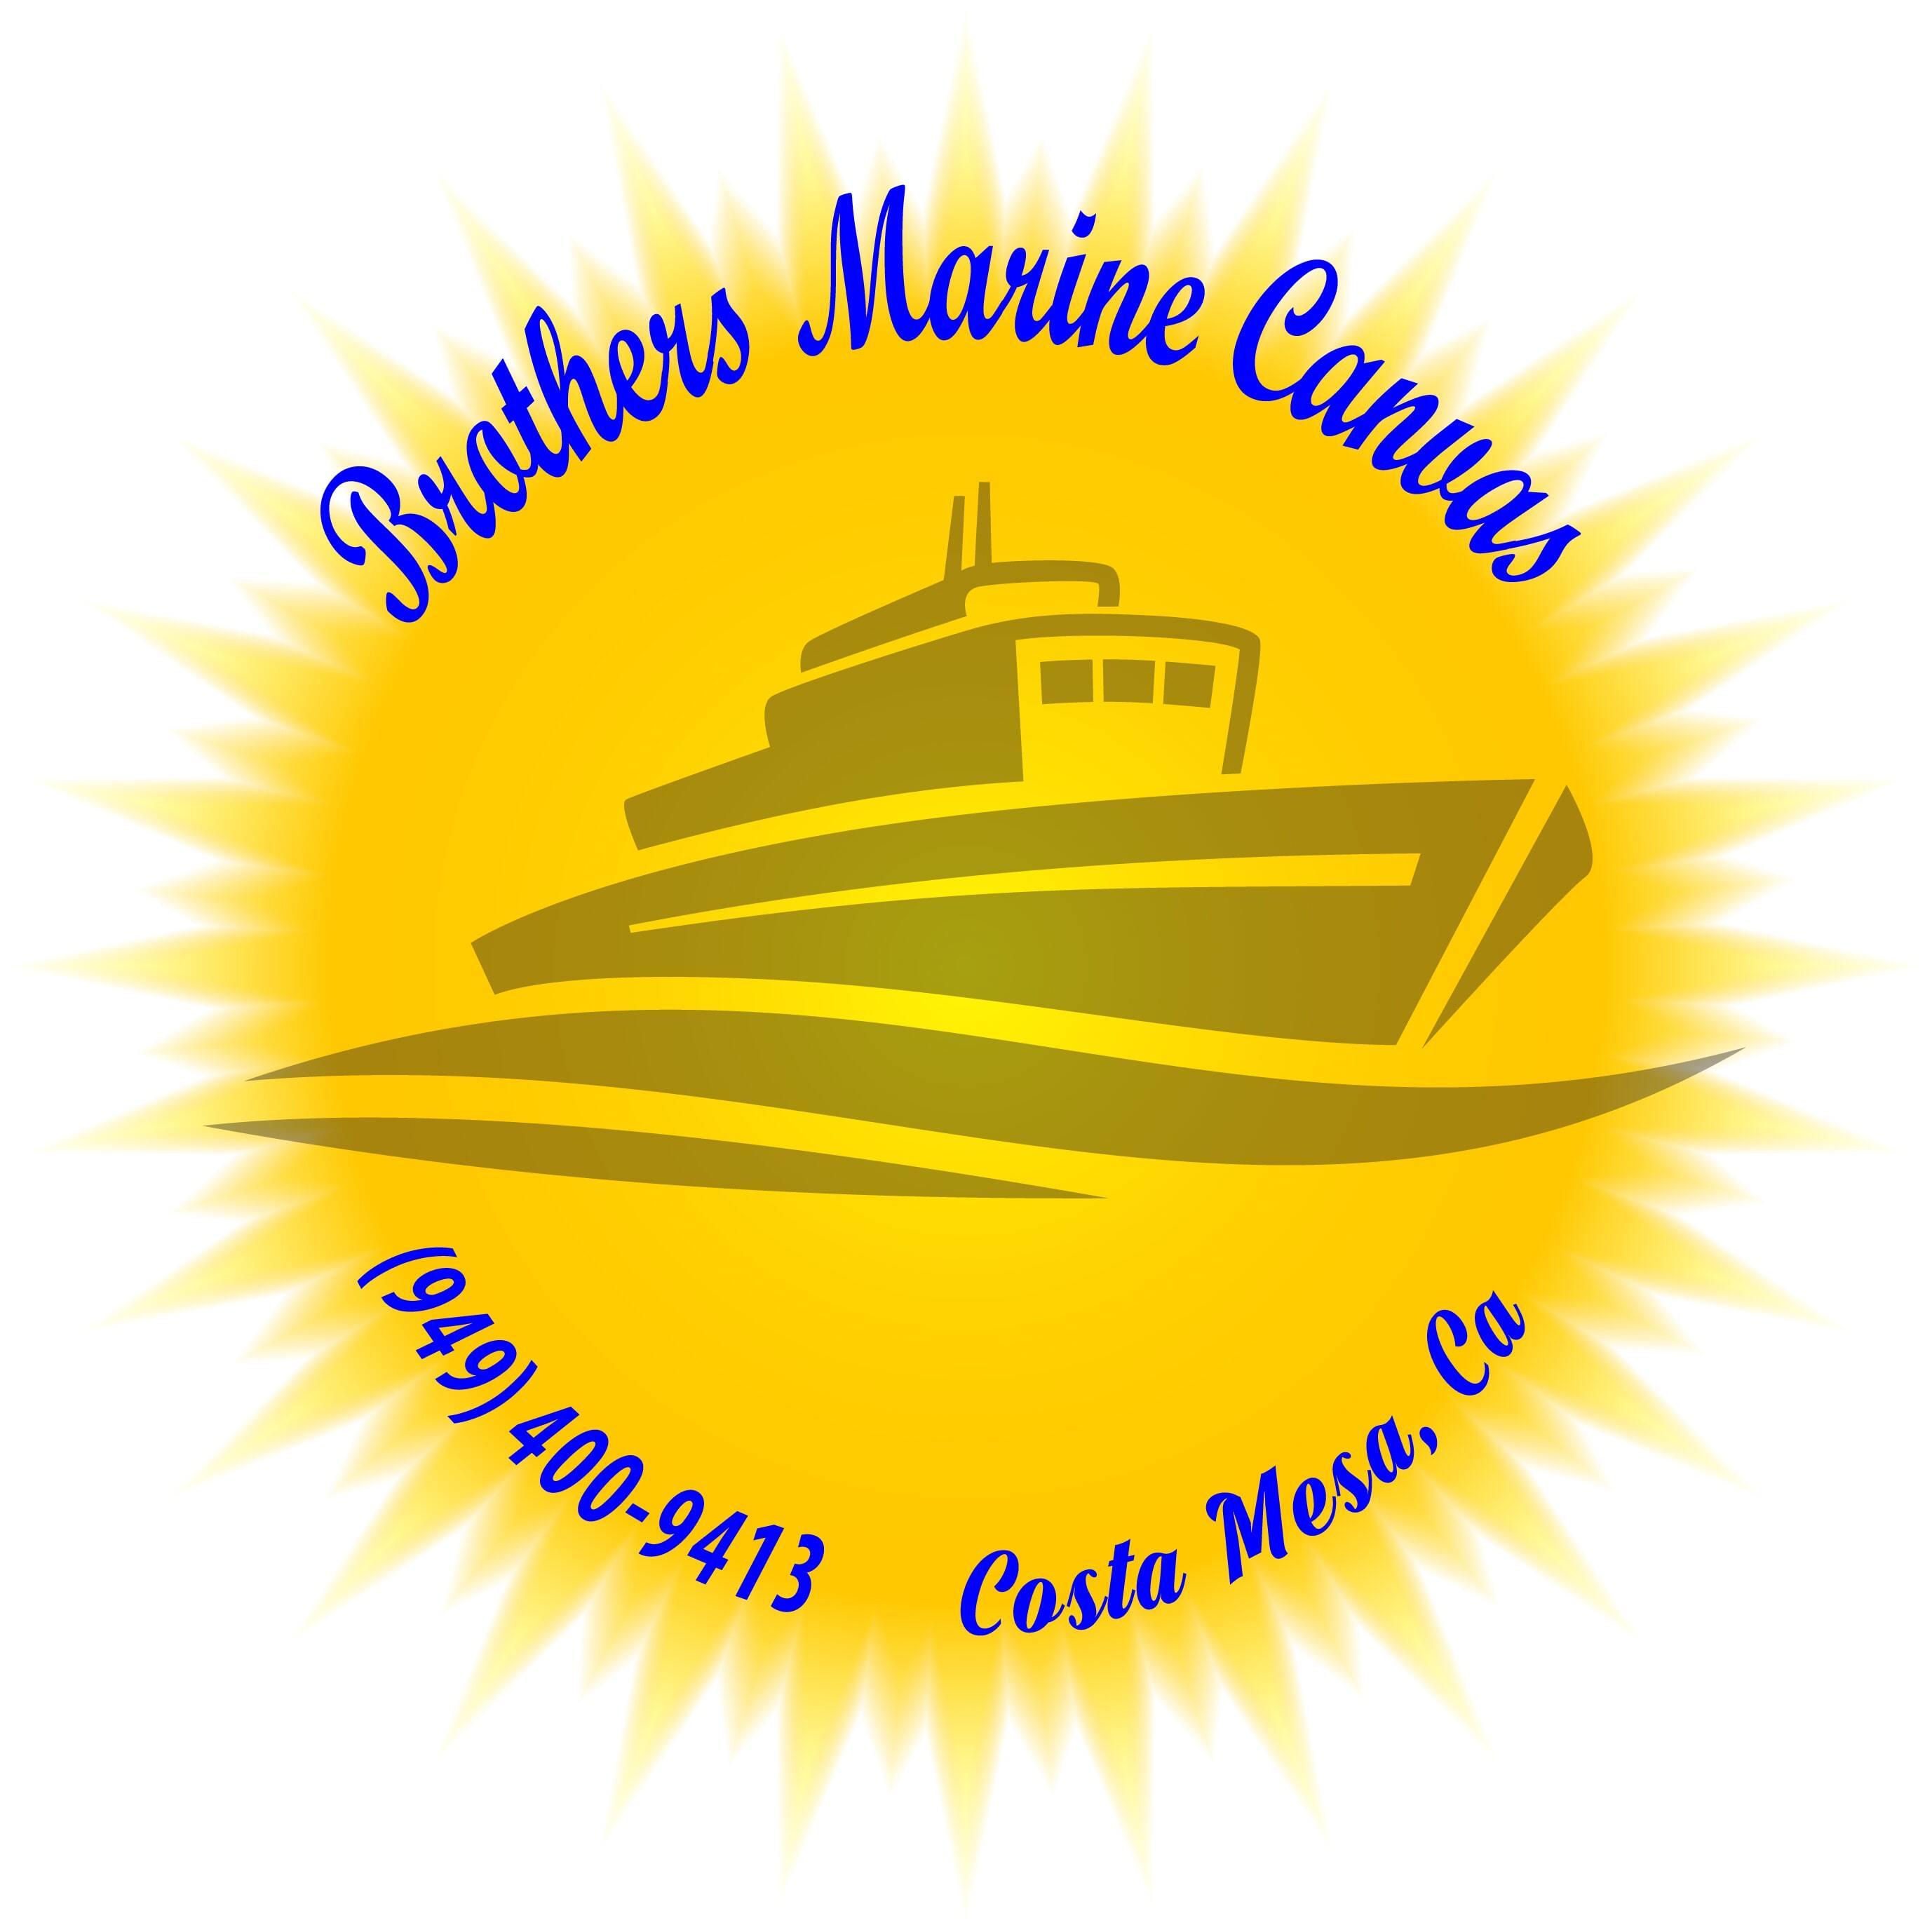 Brothers Marine Canvas - Costa Mesa, CA 92627 - (949)400-9413 | ShowMeLocal.com